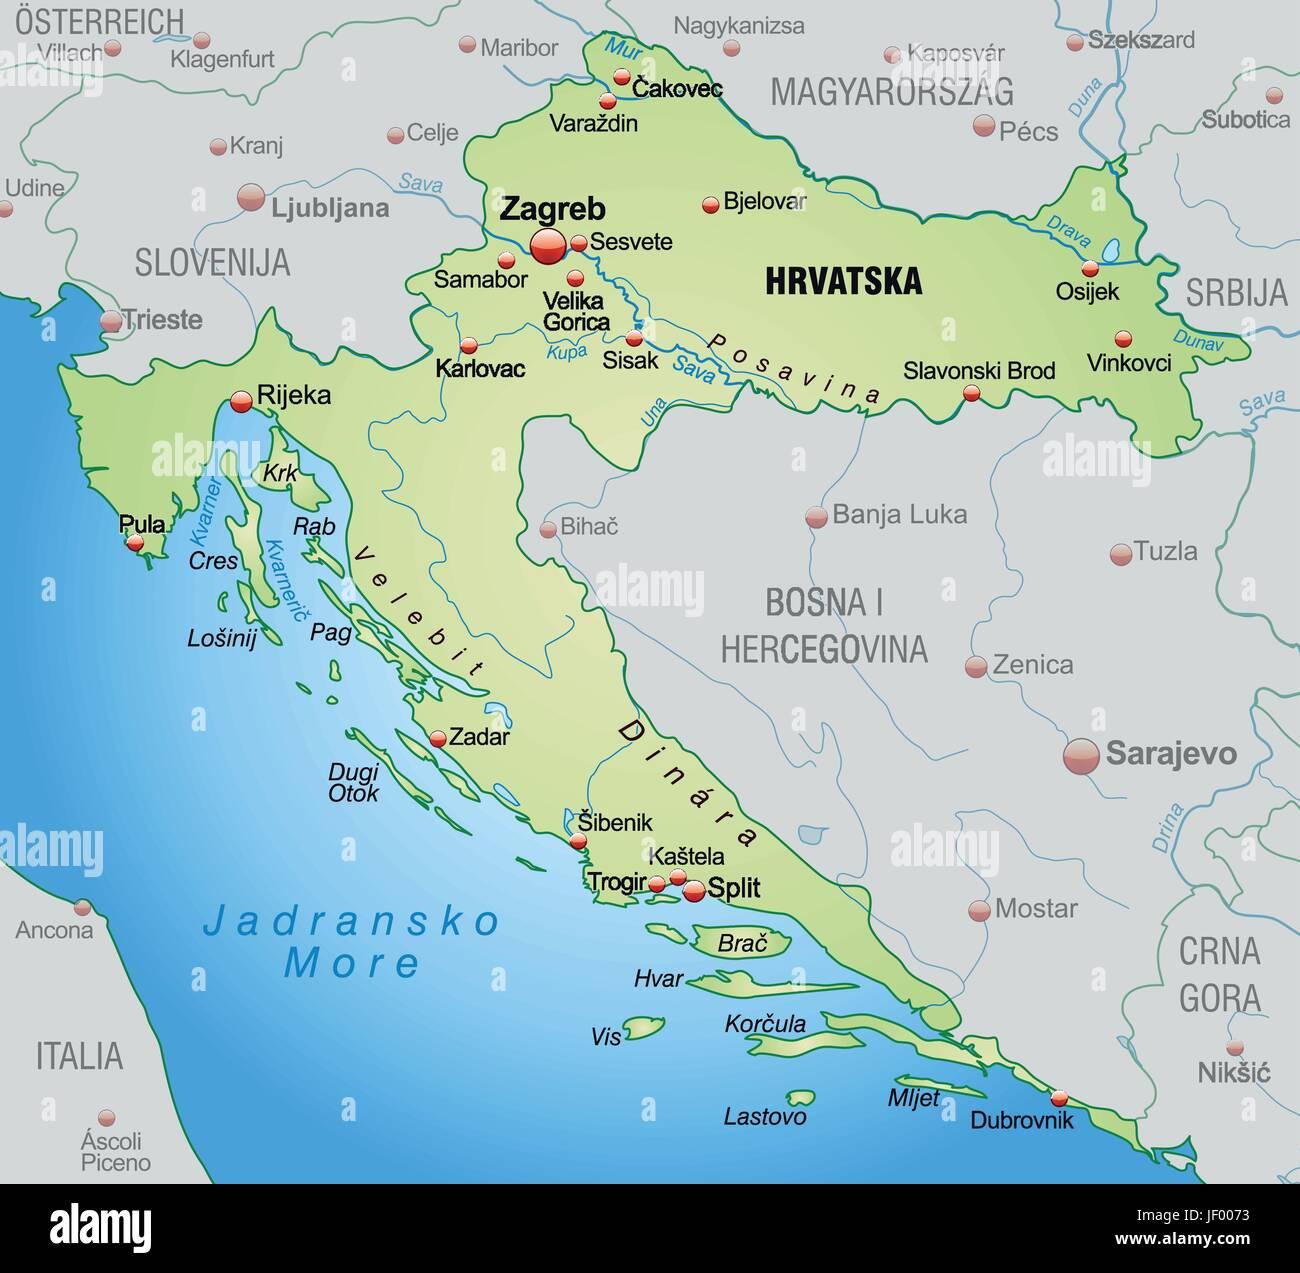 grenze karte kroatien synopse grenzen atlas. Black Bedroom Furniture Sets. Home Design Ideas